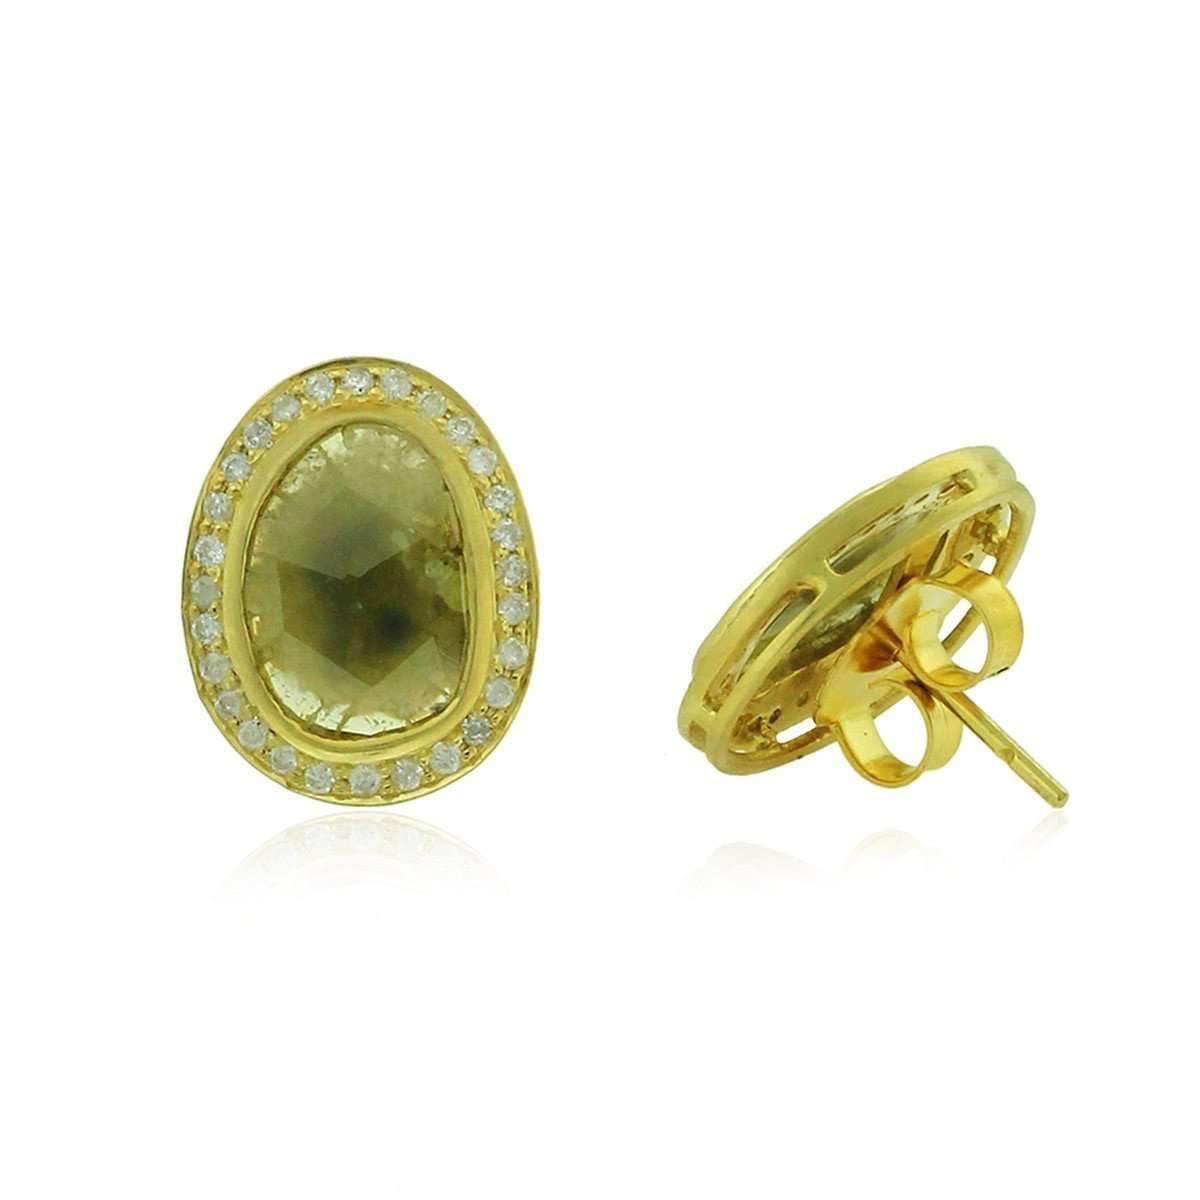 Socheec Exotic Diamond Stud Earrings zdI2v